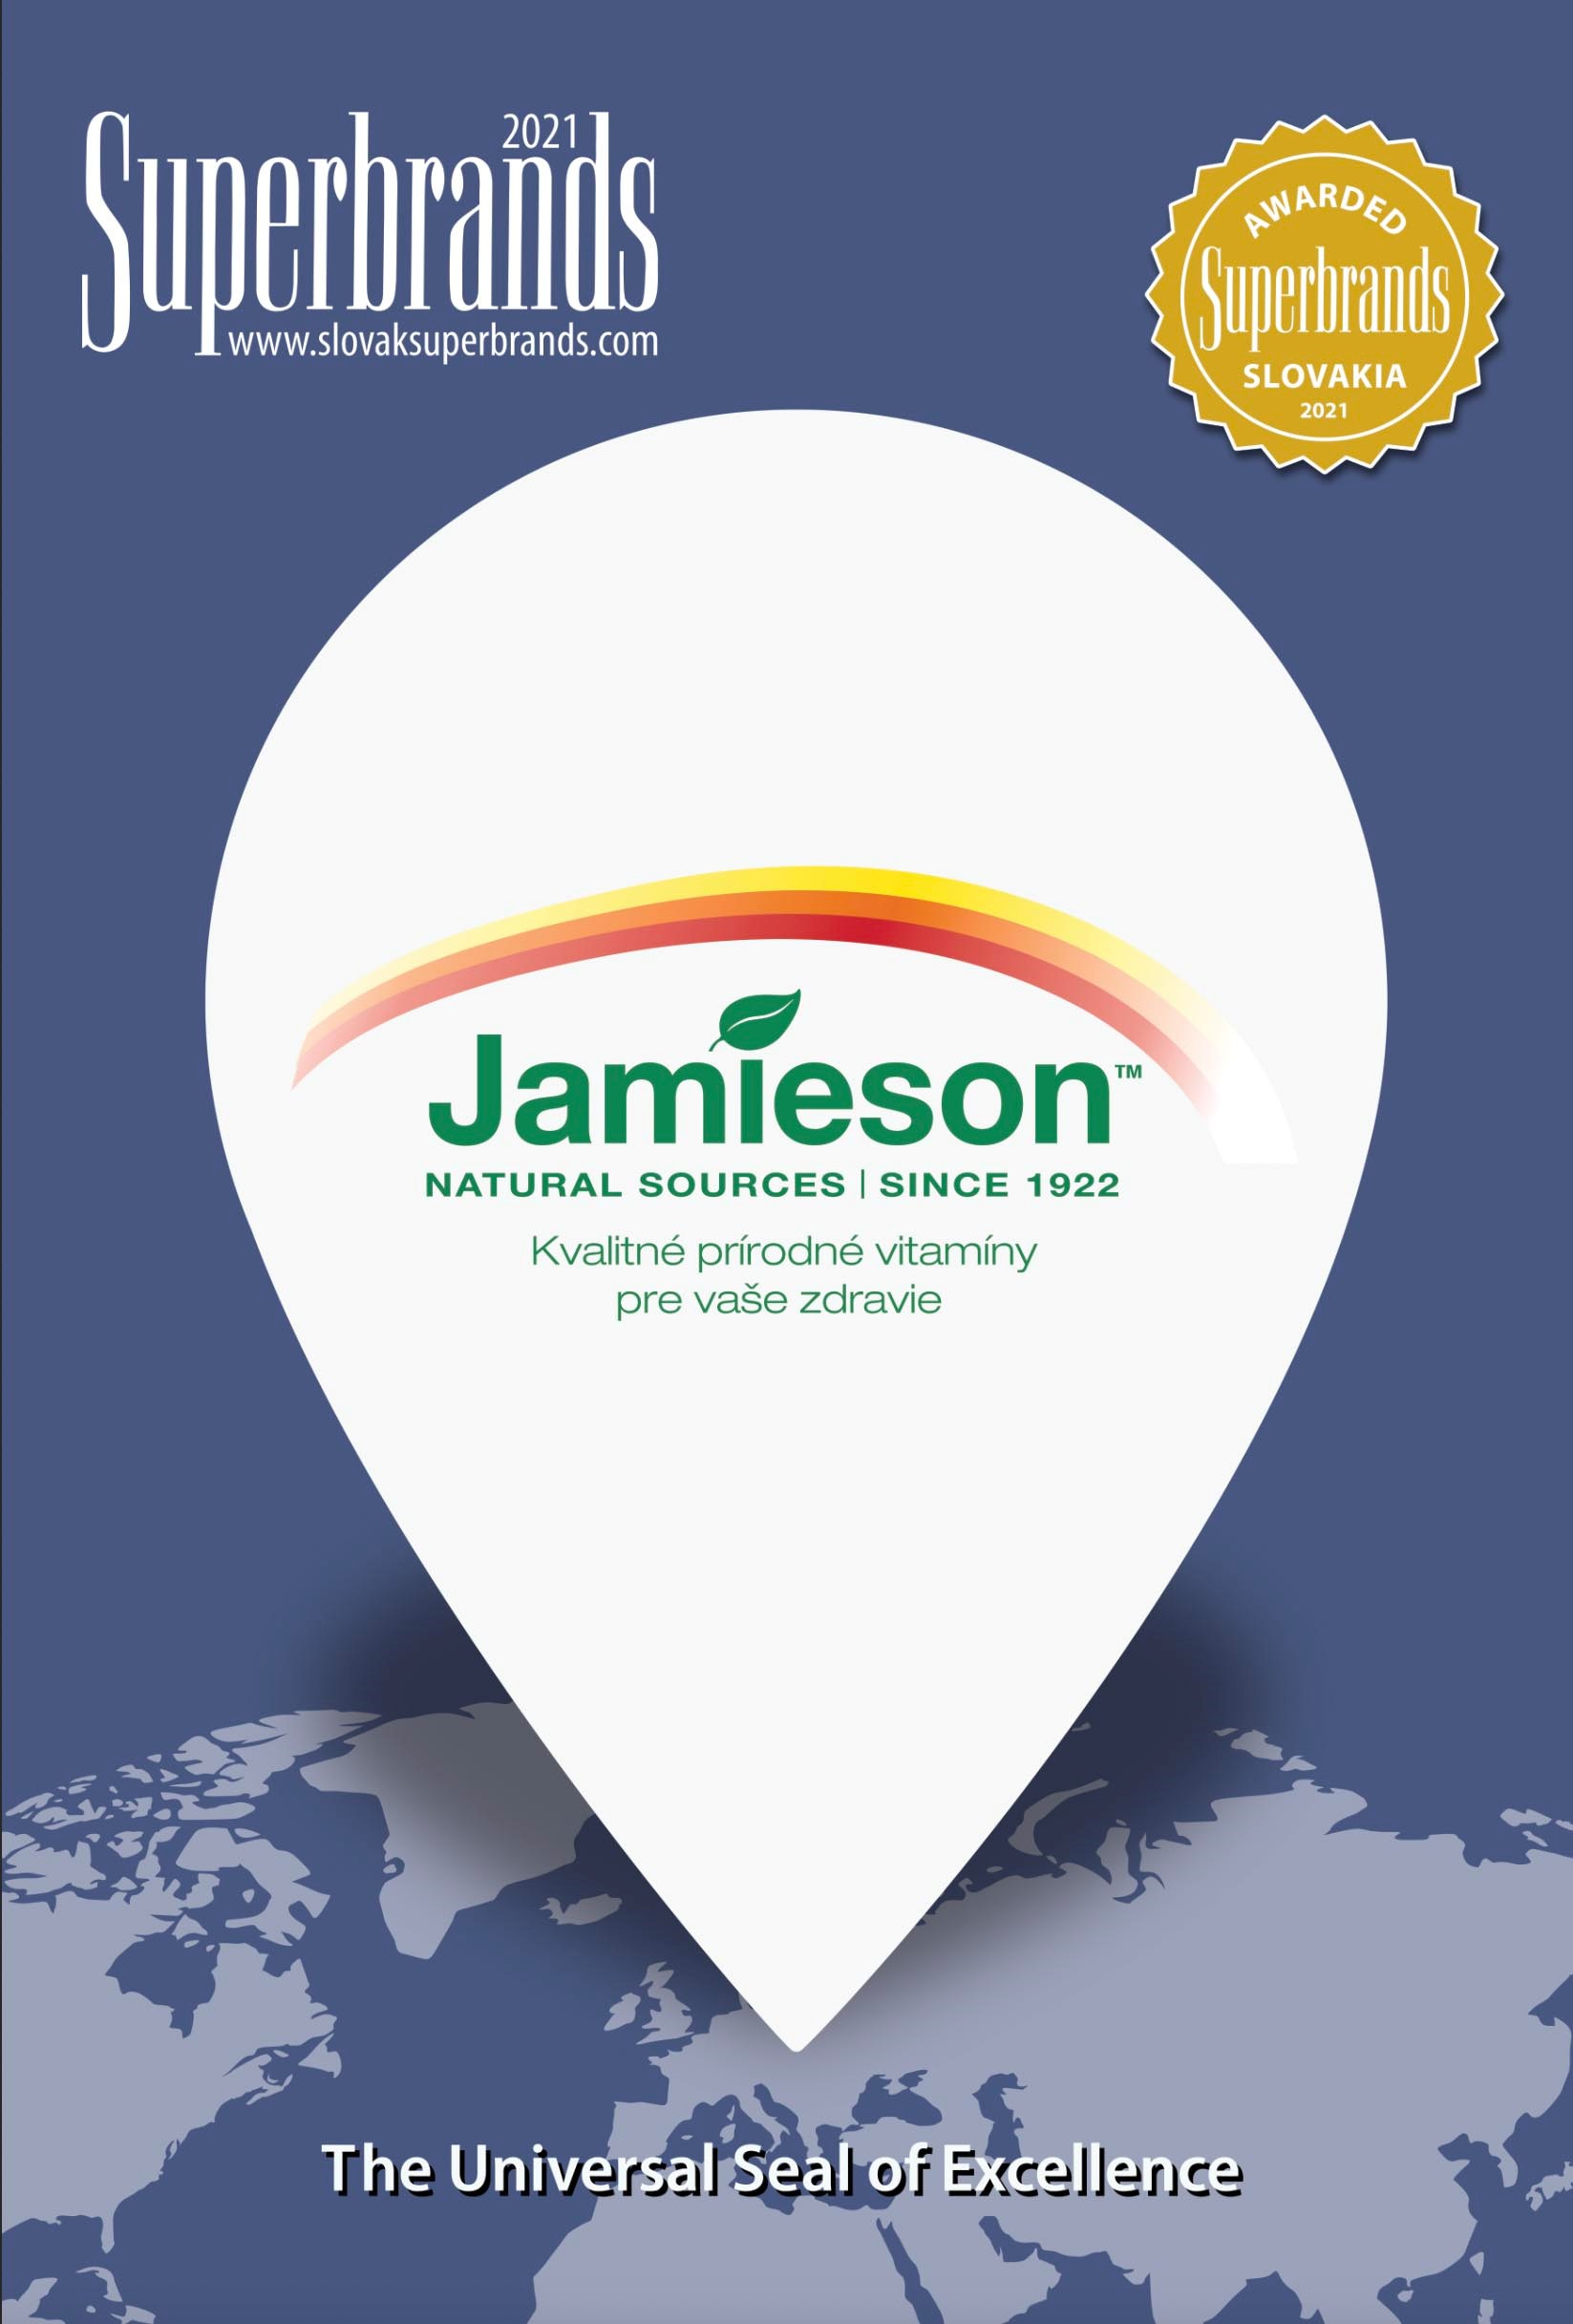 Jamieson Superbrands 2021